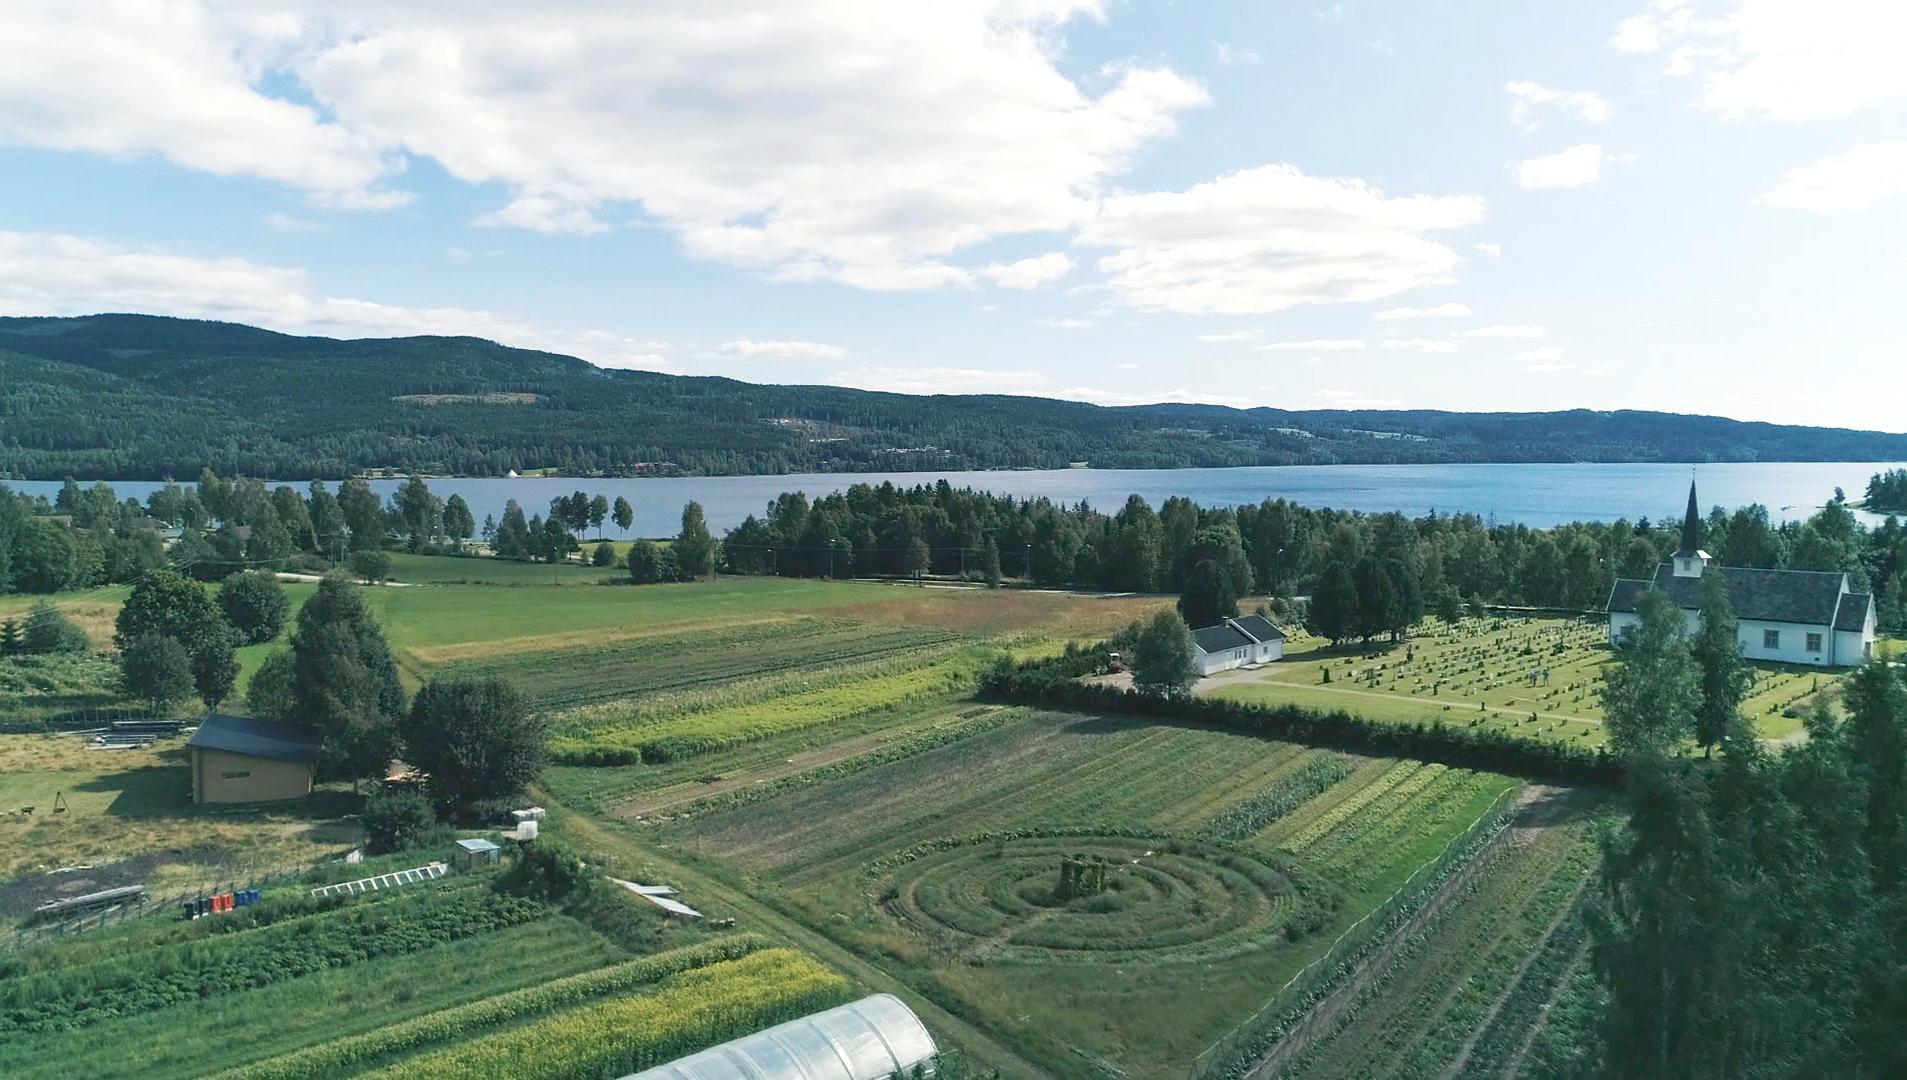 bilde gården drone 300 dpi.jpg